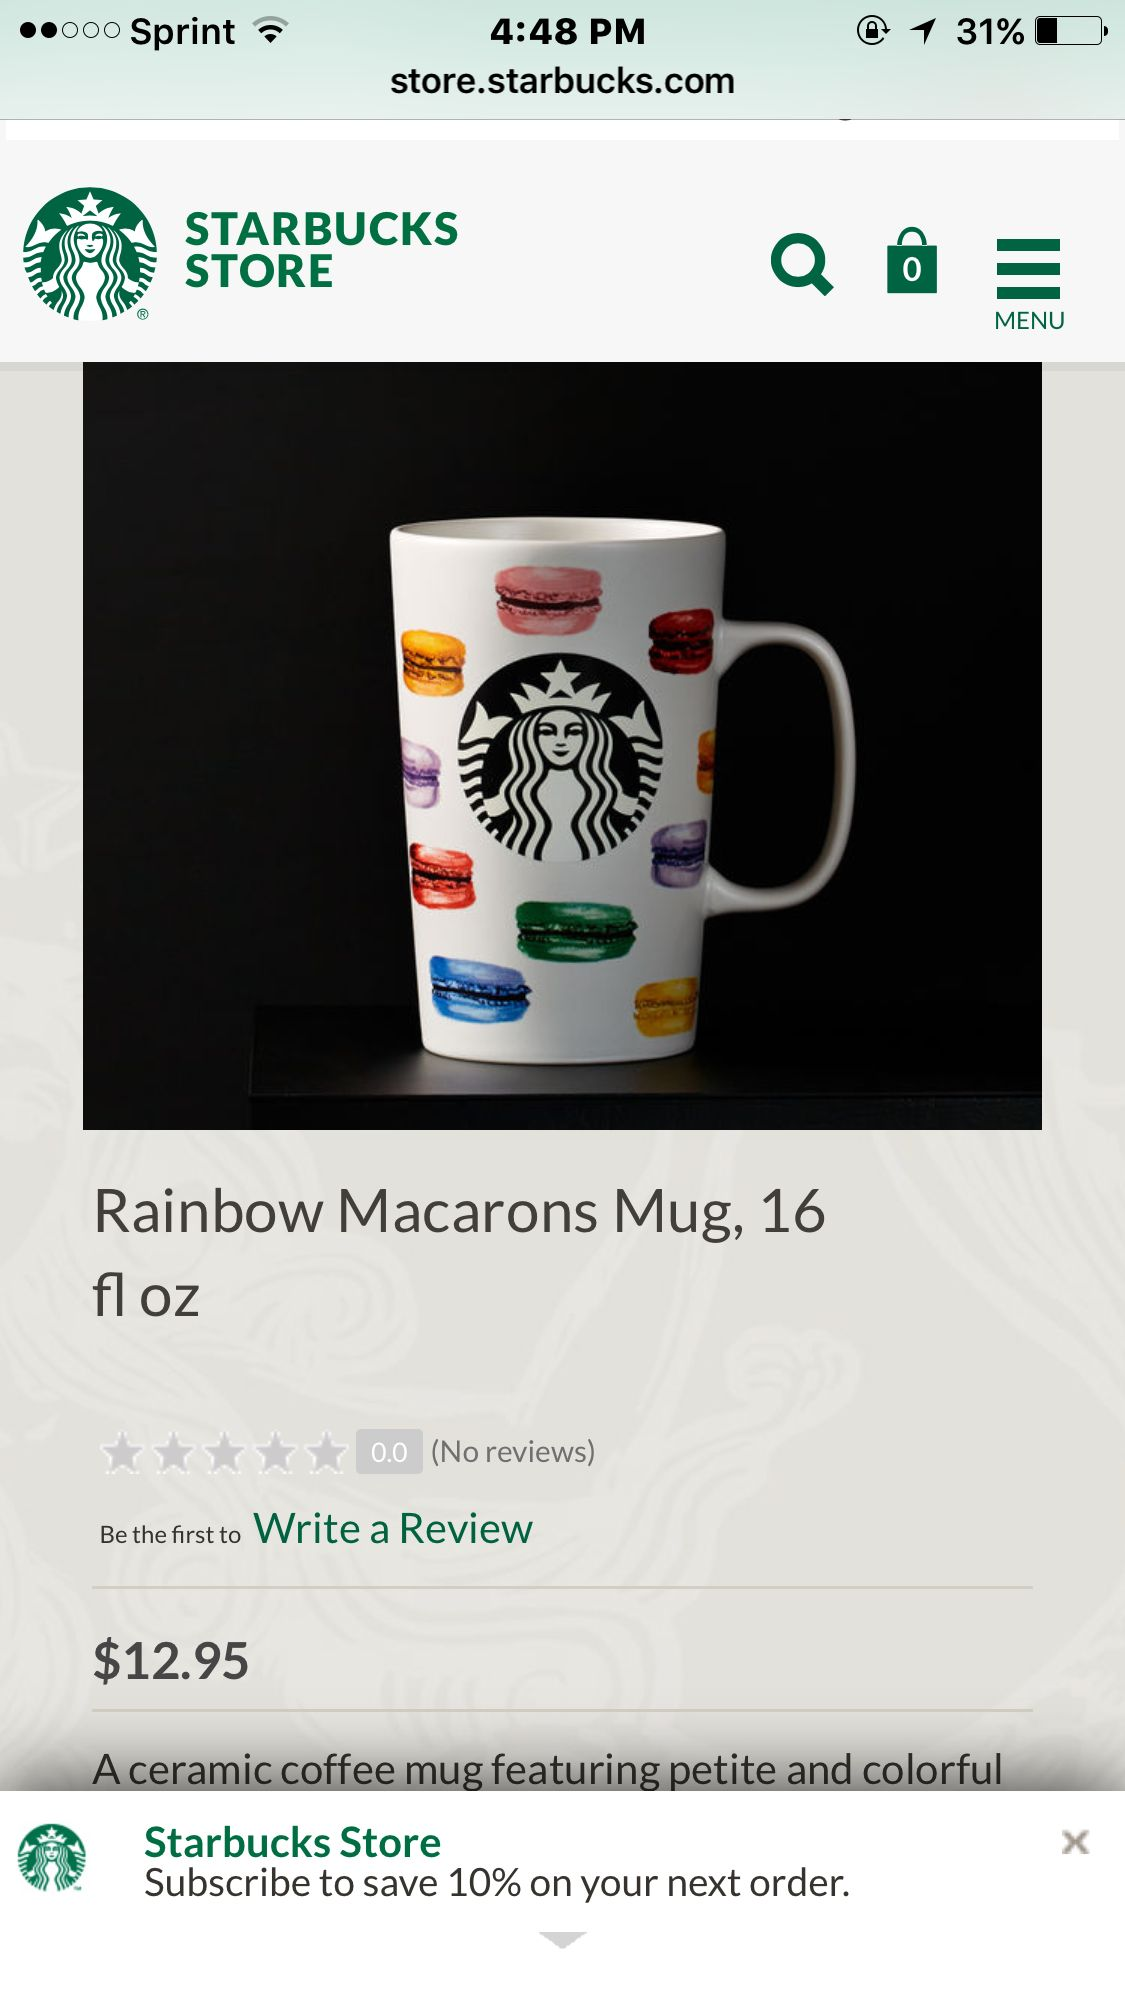 Pin by Adiel Levy on Wish List ️ Starbucks store, Mugs